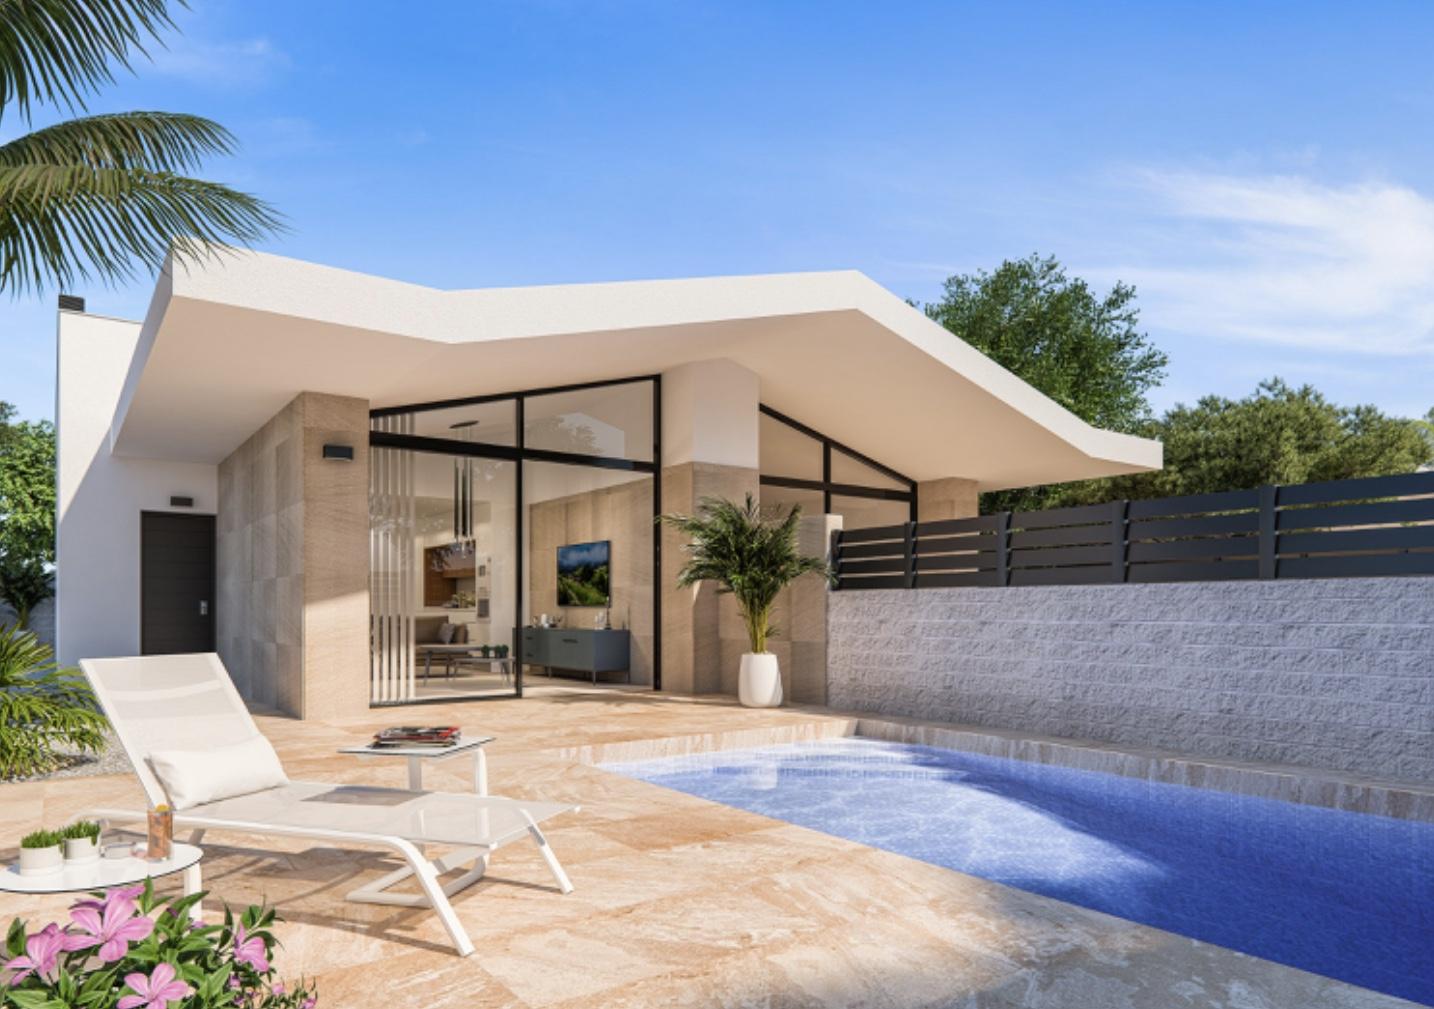 Benimar villa €209.900